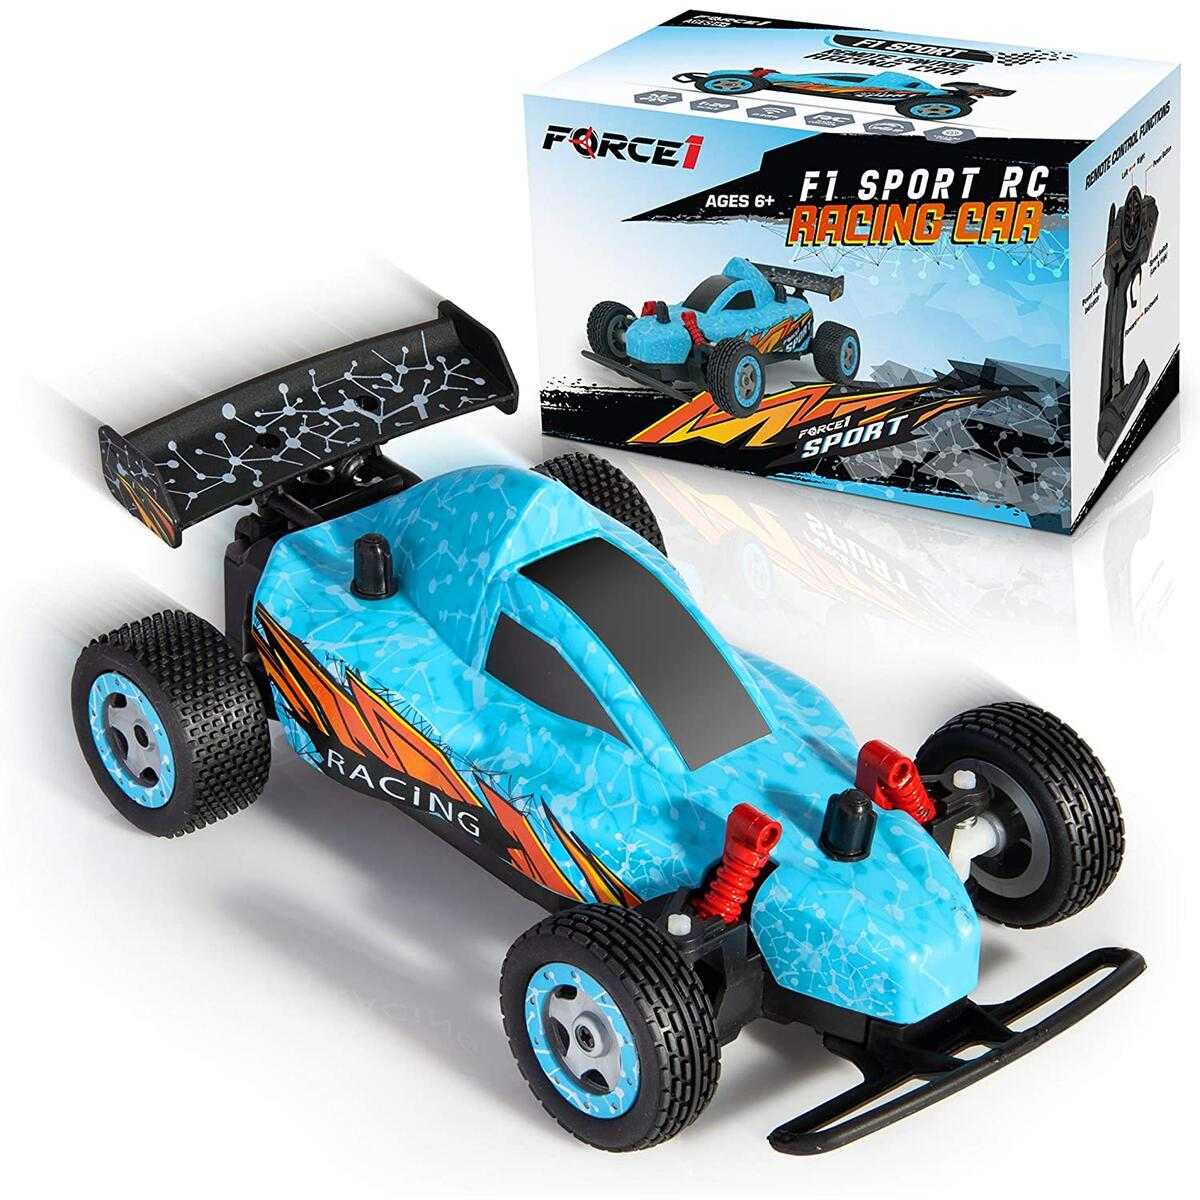 F1 Sport RC Car